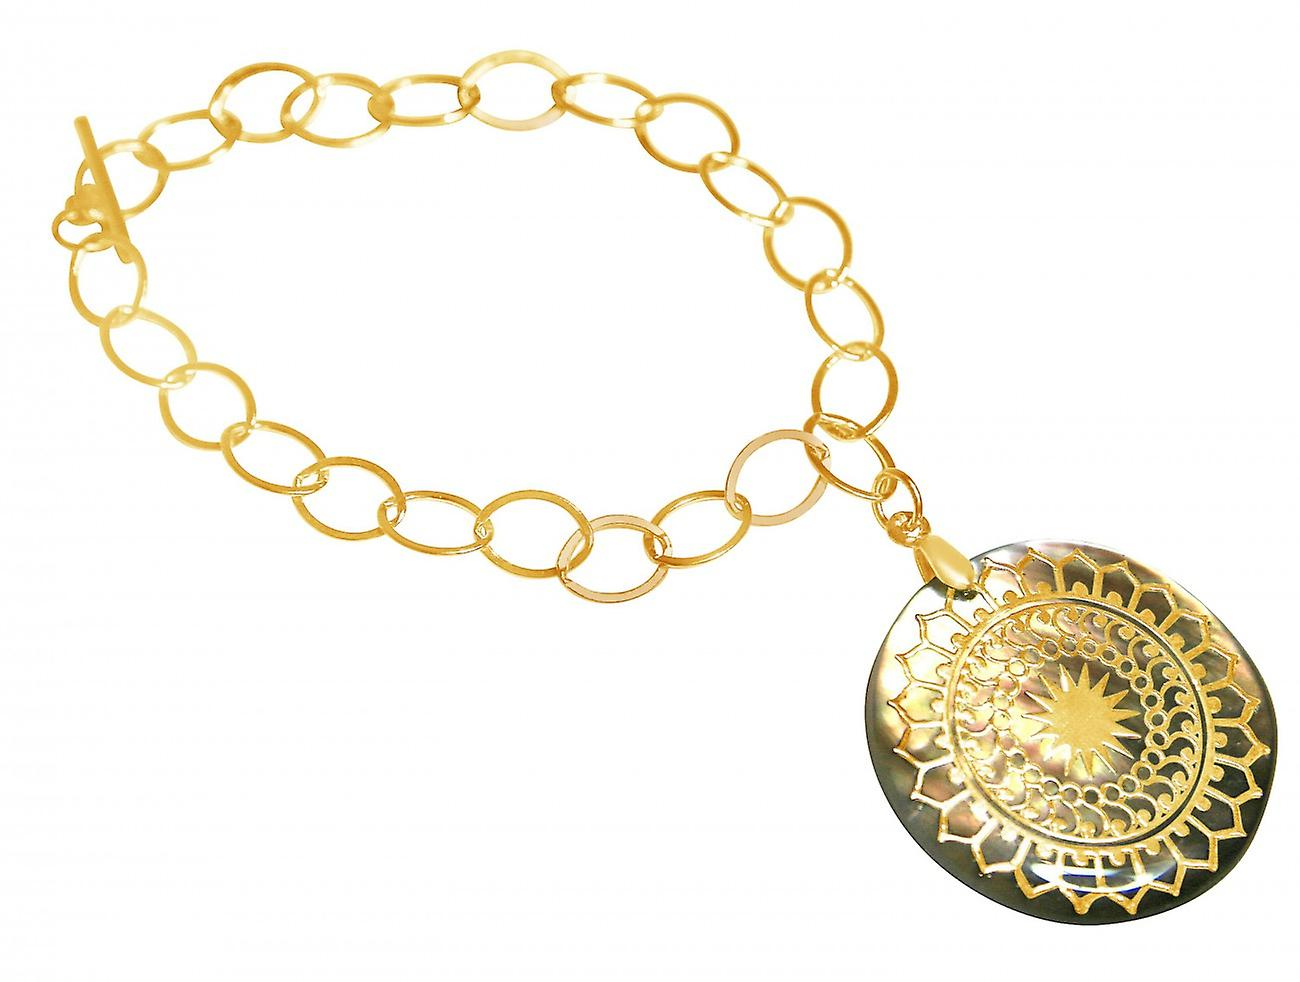 Gemshine - Damen - Armband - Anhänger - Medaillon - Perlmutt - Vergoldet - Grau - 3 cm